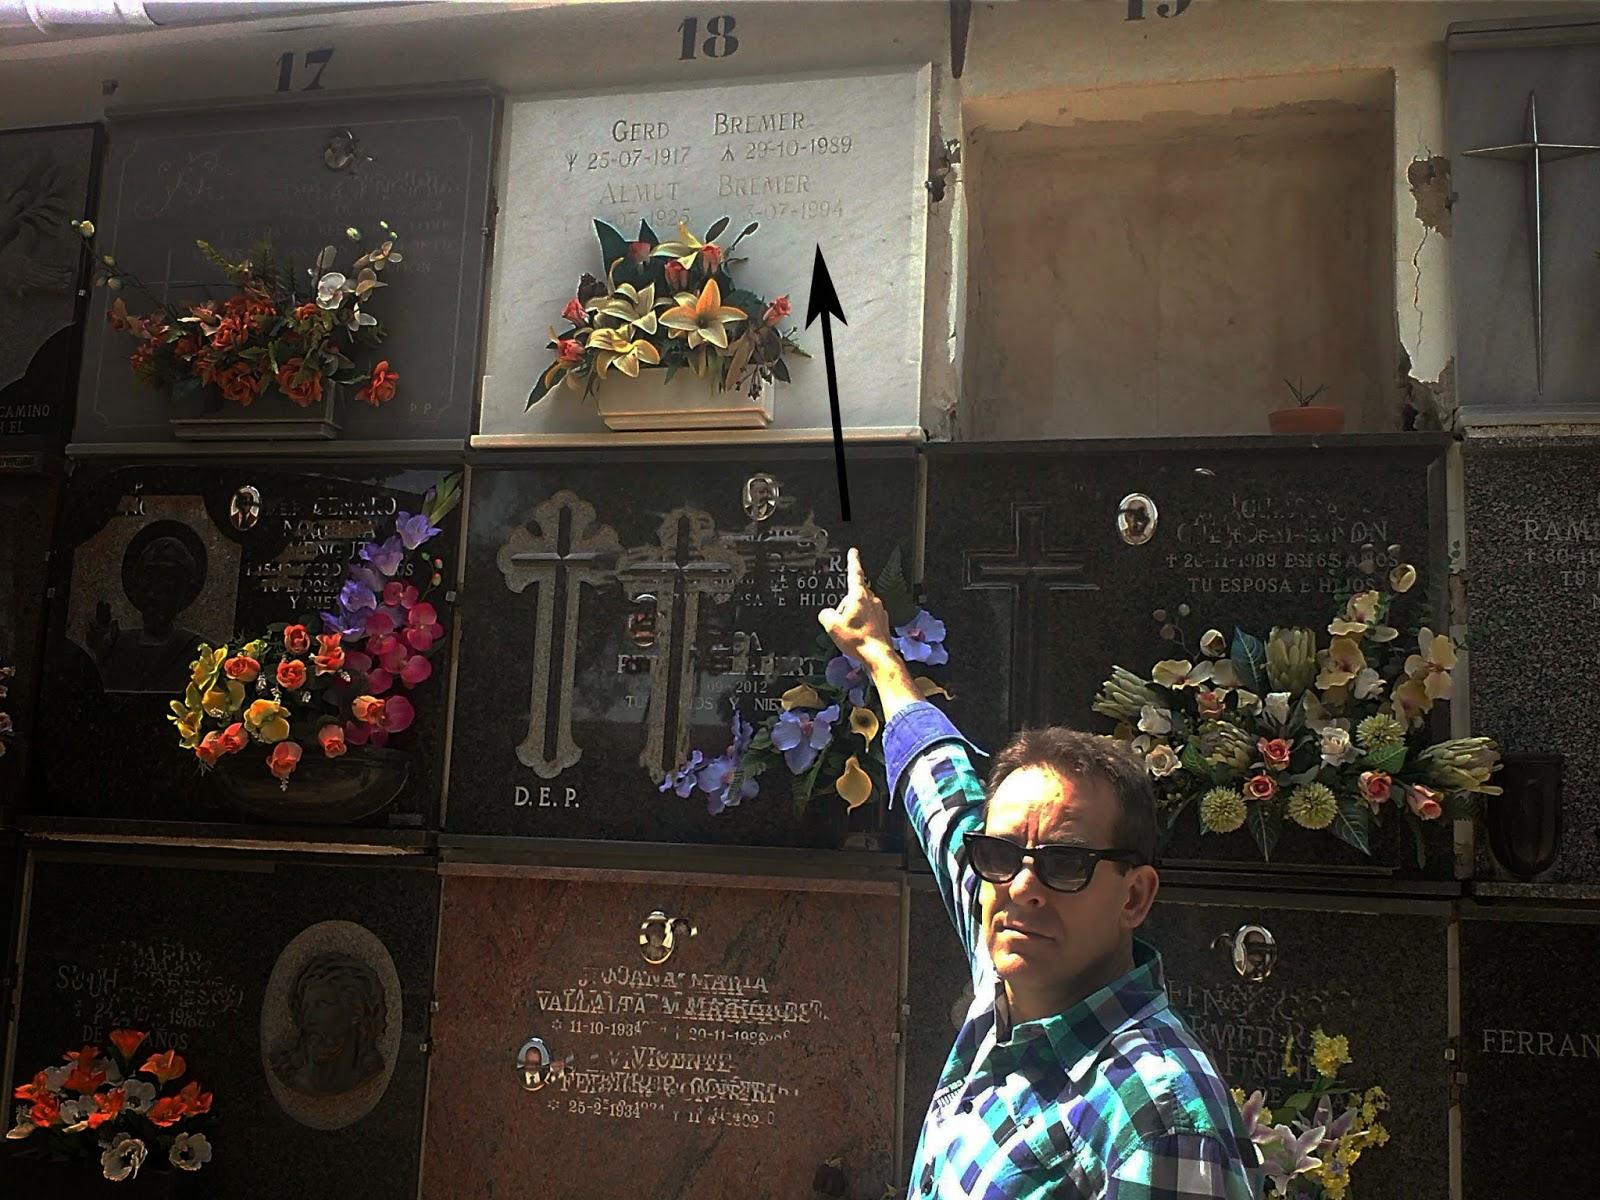 Nicho de Bremer. Fuente: http://jotamartinezarribas.blogspot.com.es/